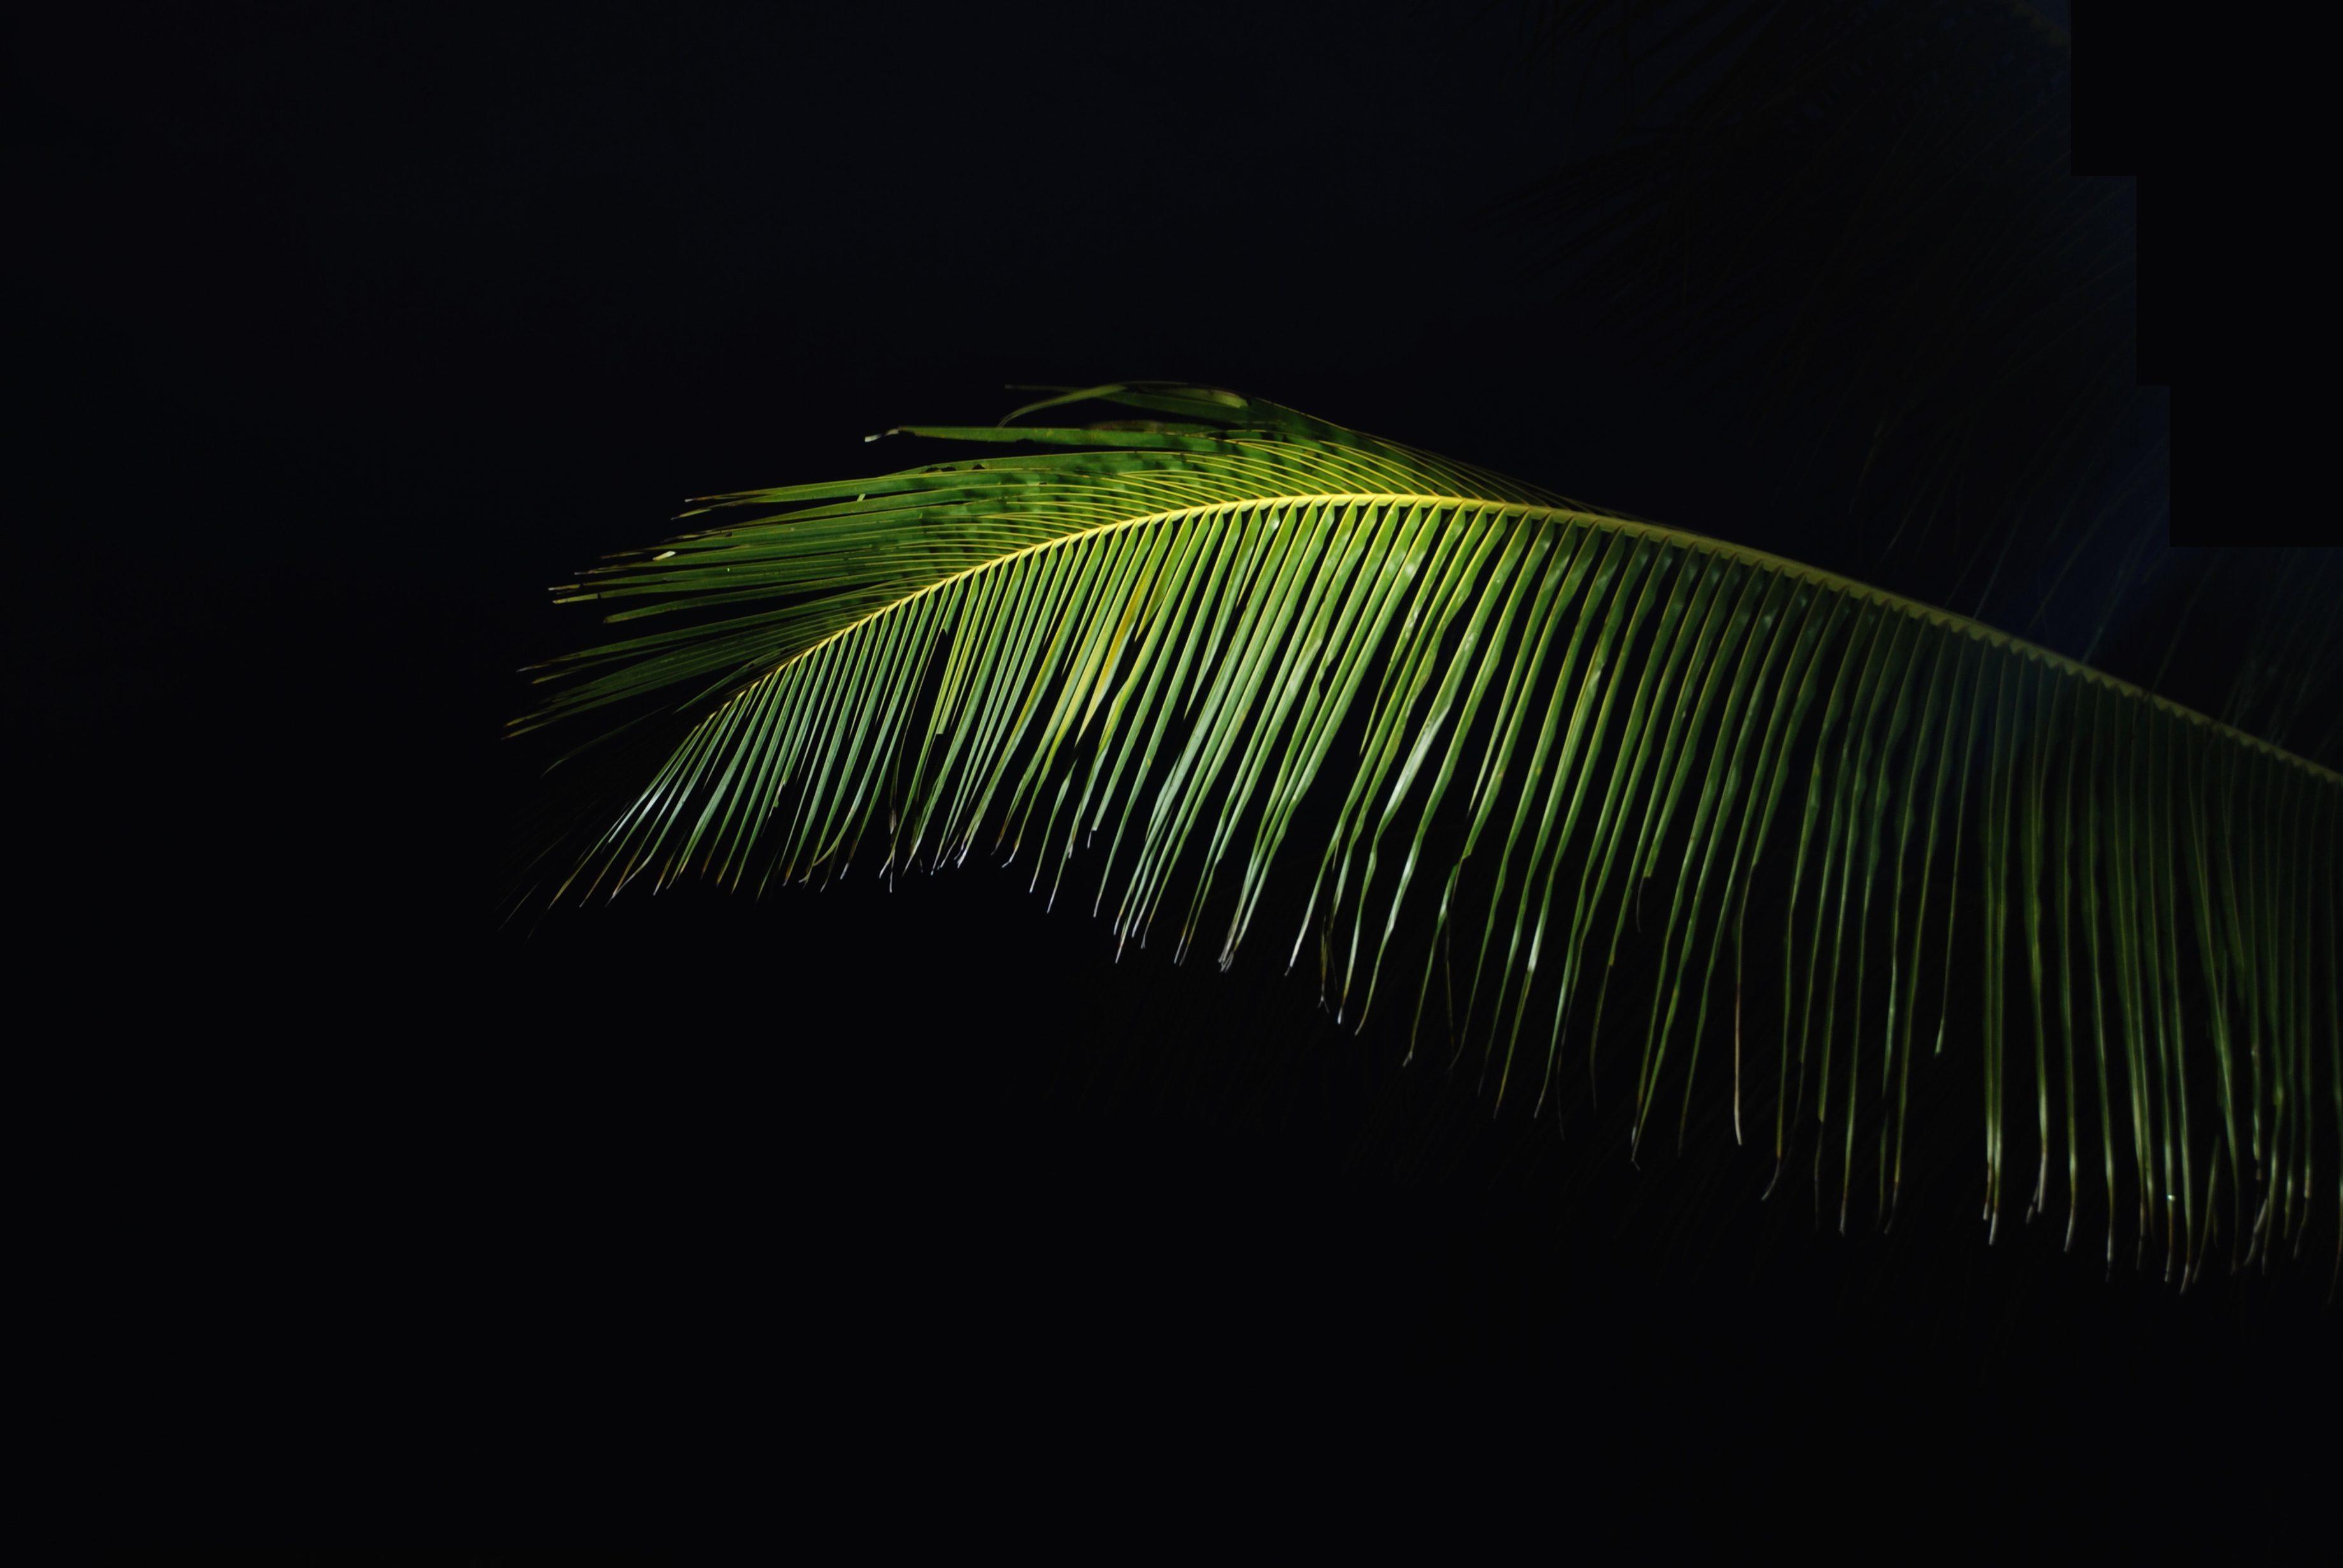 image libre feuilles de palmier feuille verte obscurit. Black Bedroom Furniture Sets. Home Design Ideas